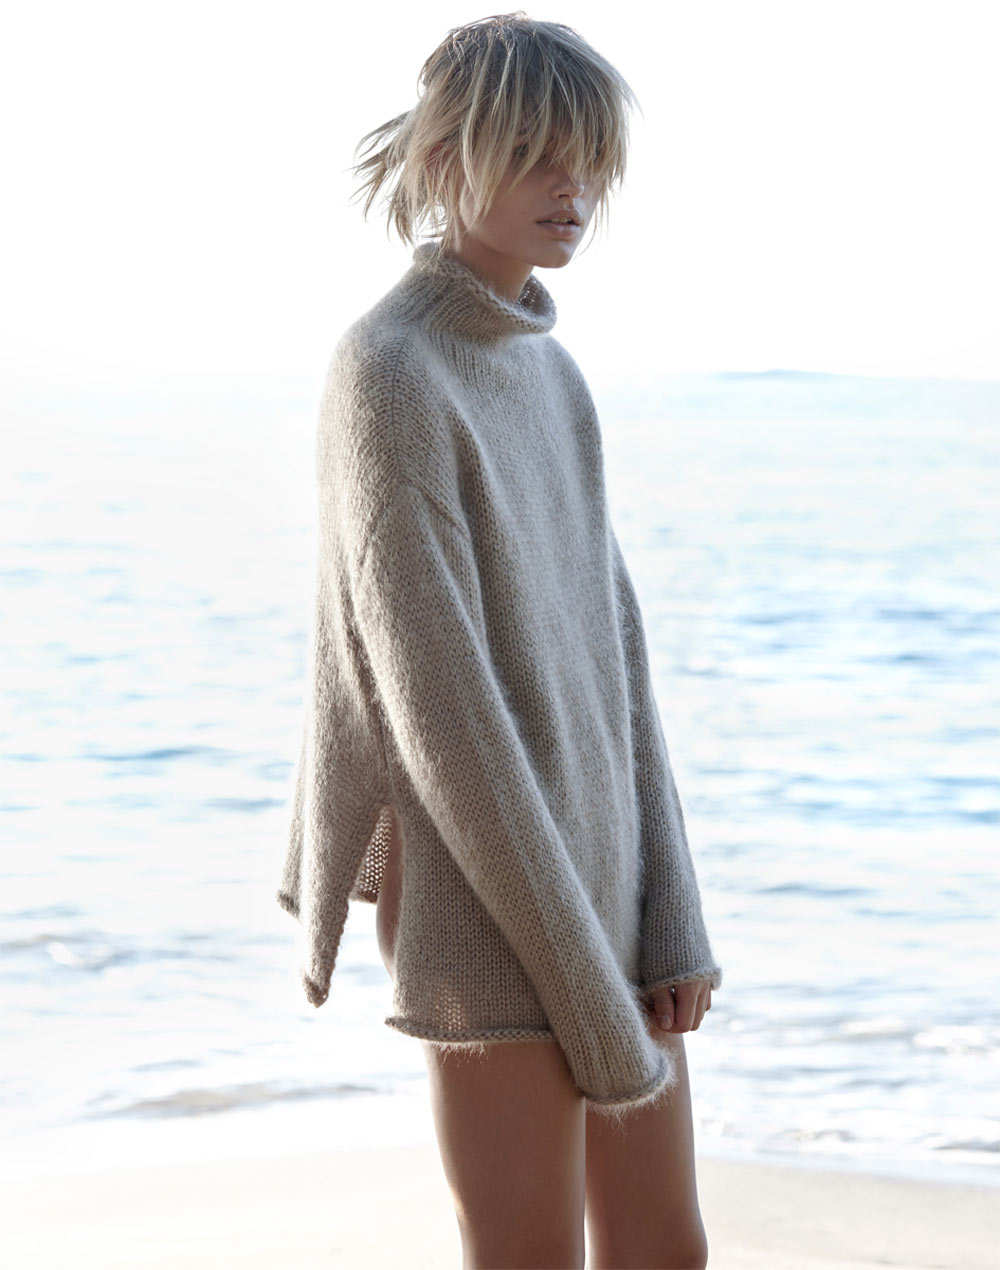 louise, mikkelsen, by, stephen, ward, elle, australia, february, 2015, Oracle, Fox, winter, beach, chunky, knit, editorial,